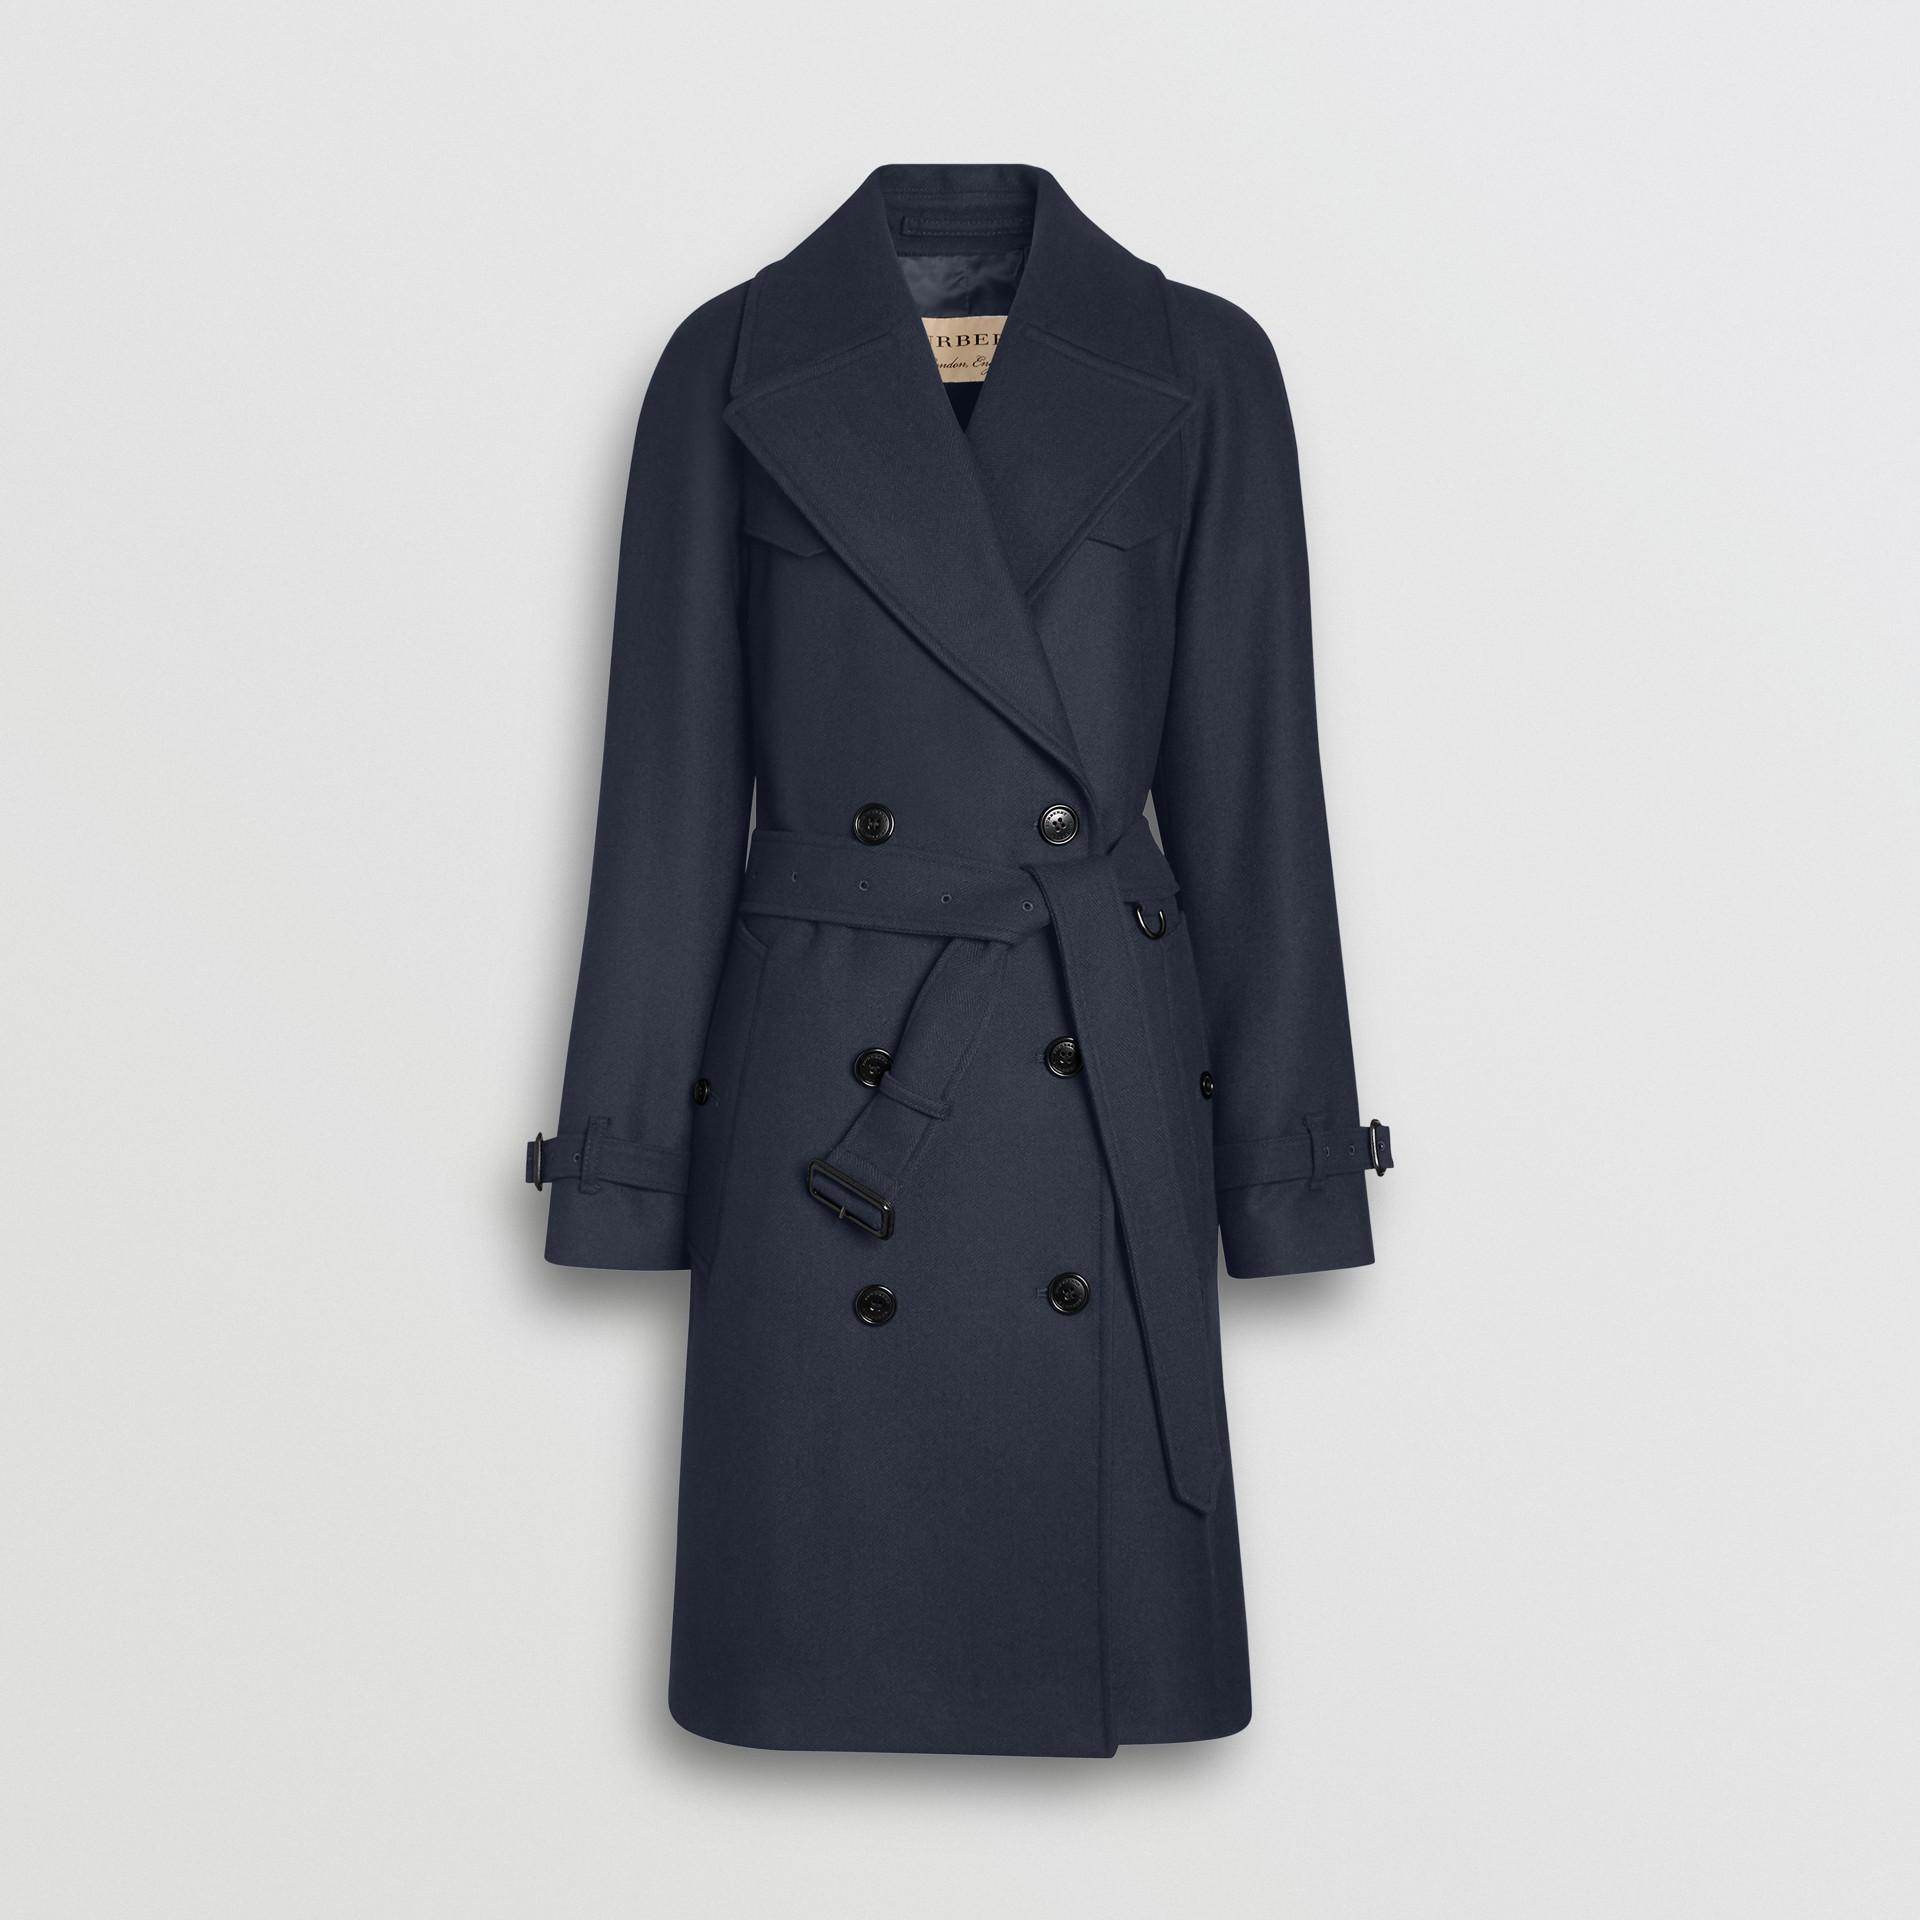 Herringbone Wool Cashmere Blend Trench Coat in Navy - Women | Burberry - gallery image 3